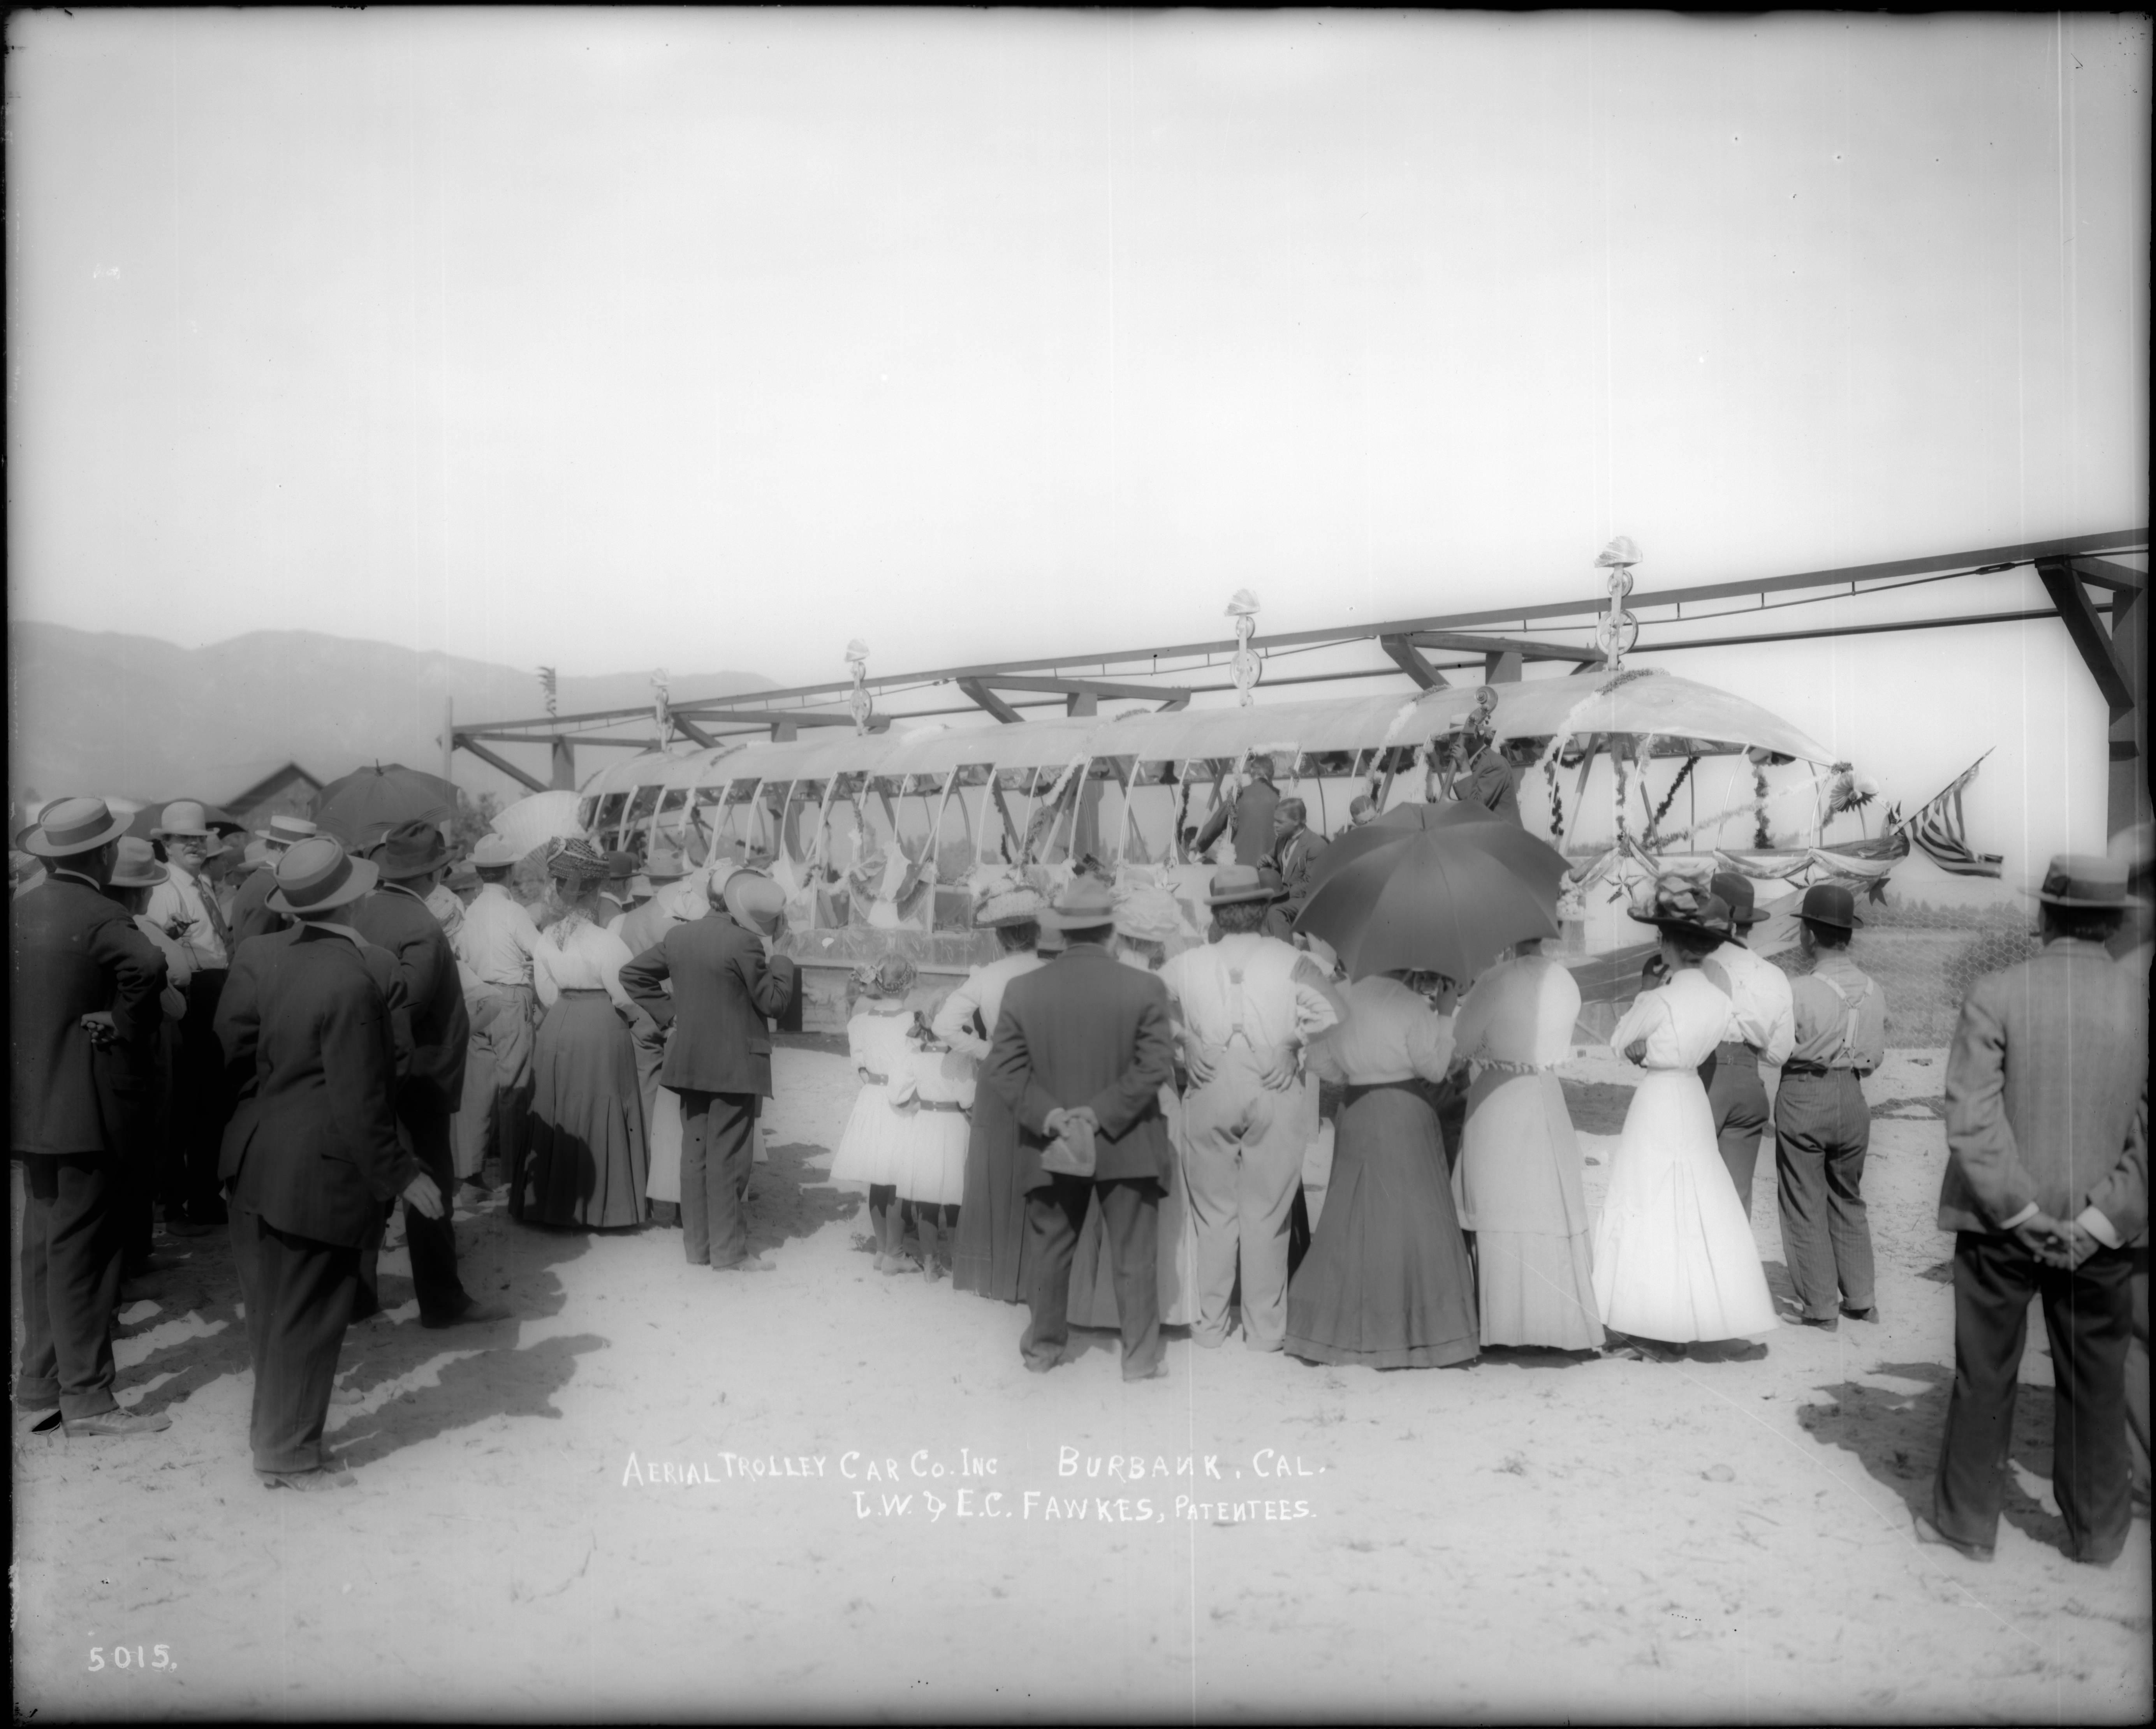 Aerial Swallow (experimental monorail, Burbank, 1910-12)